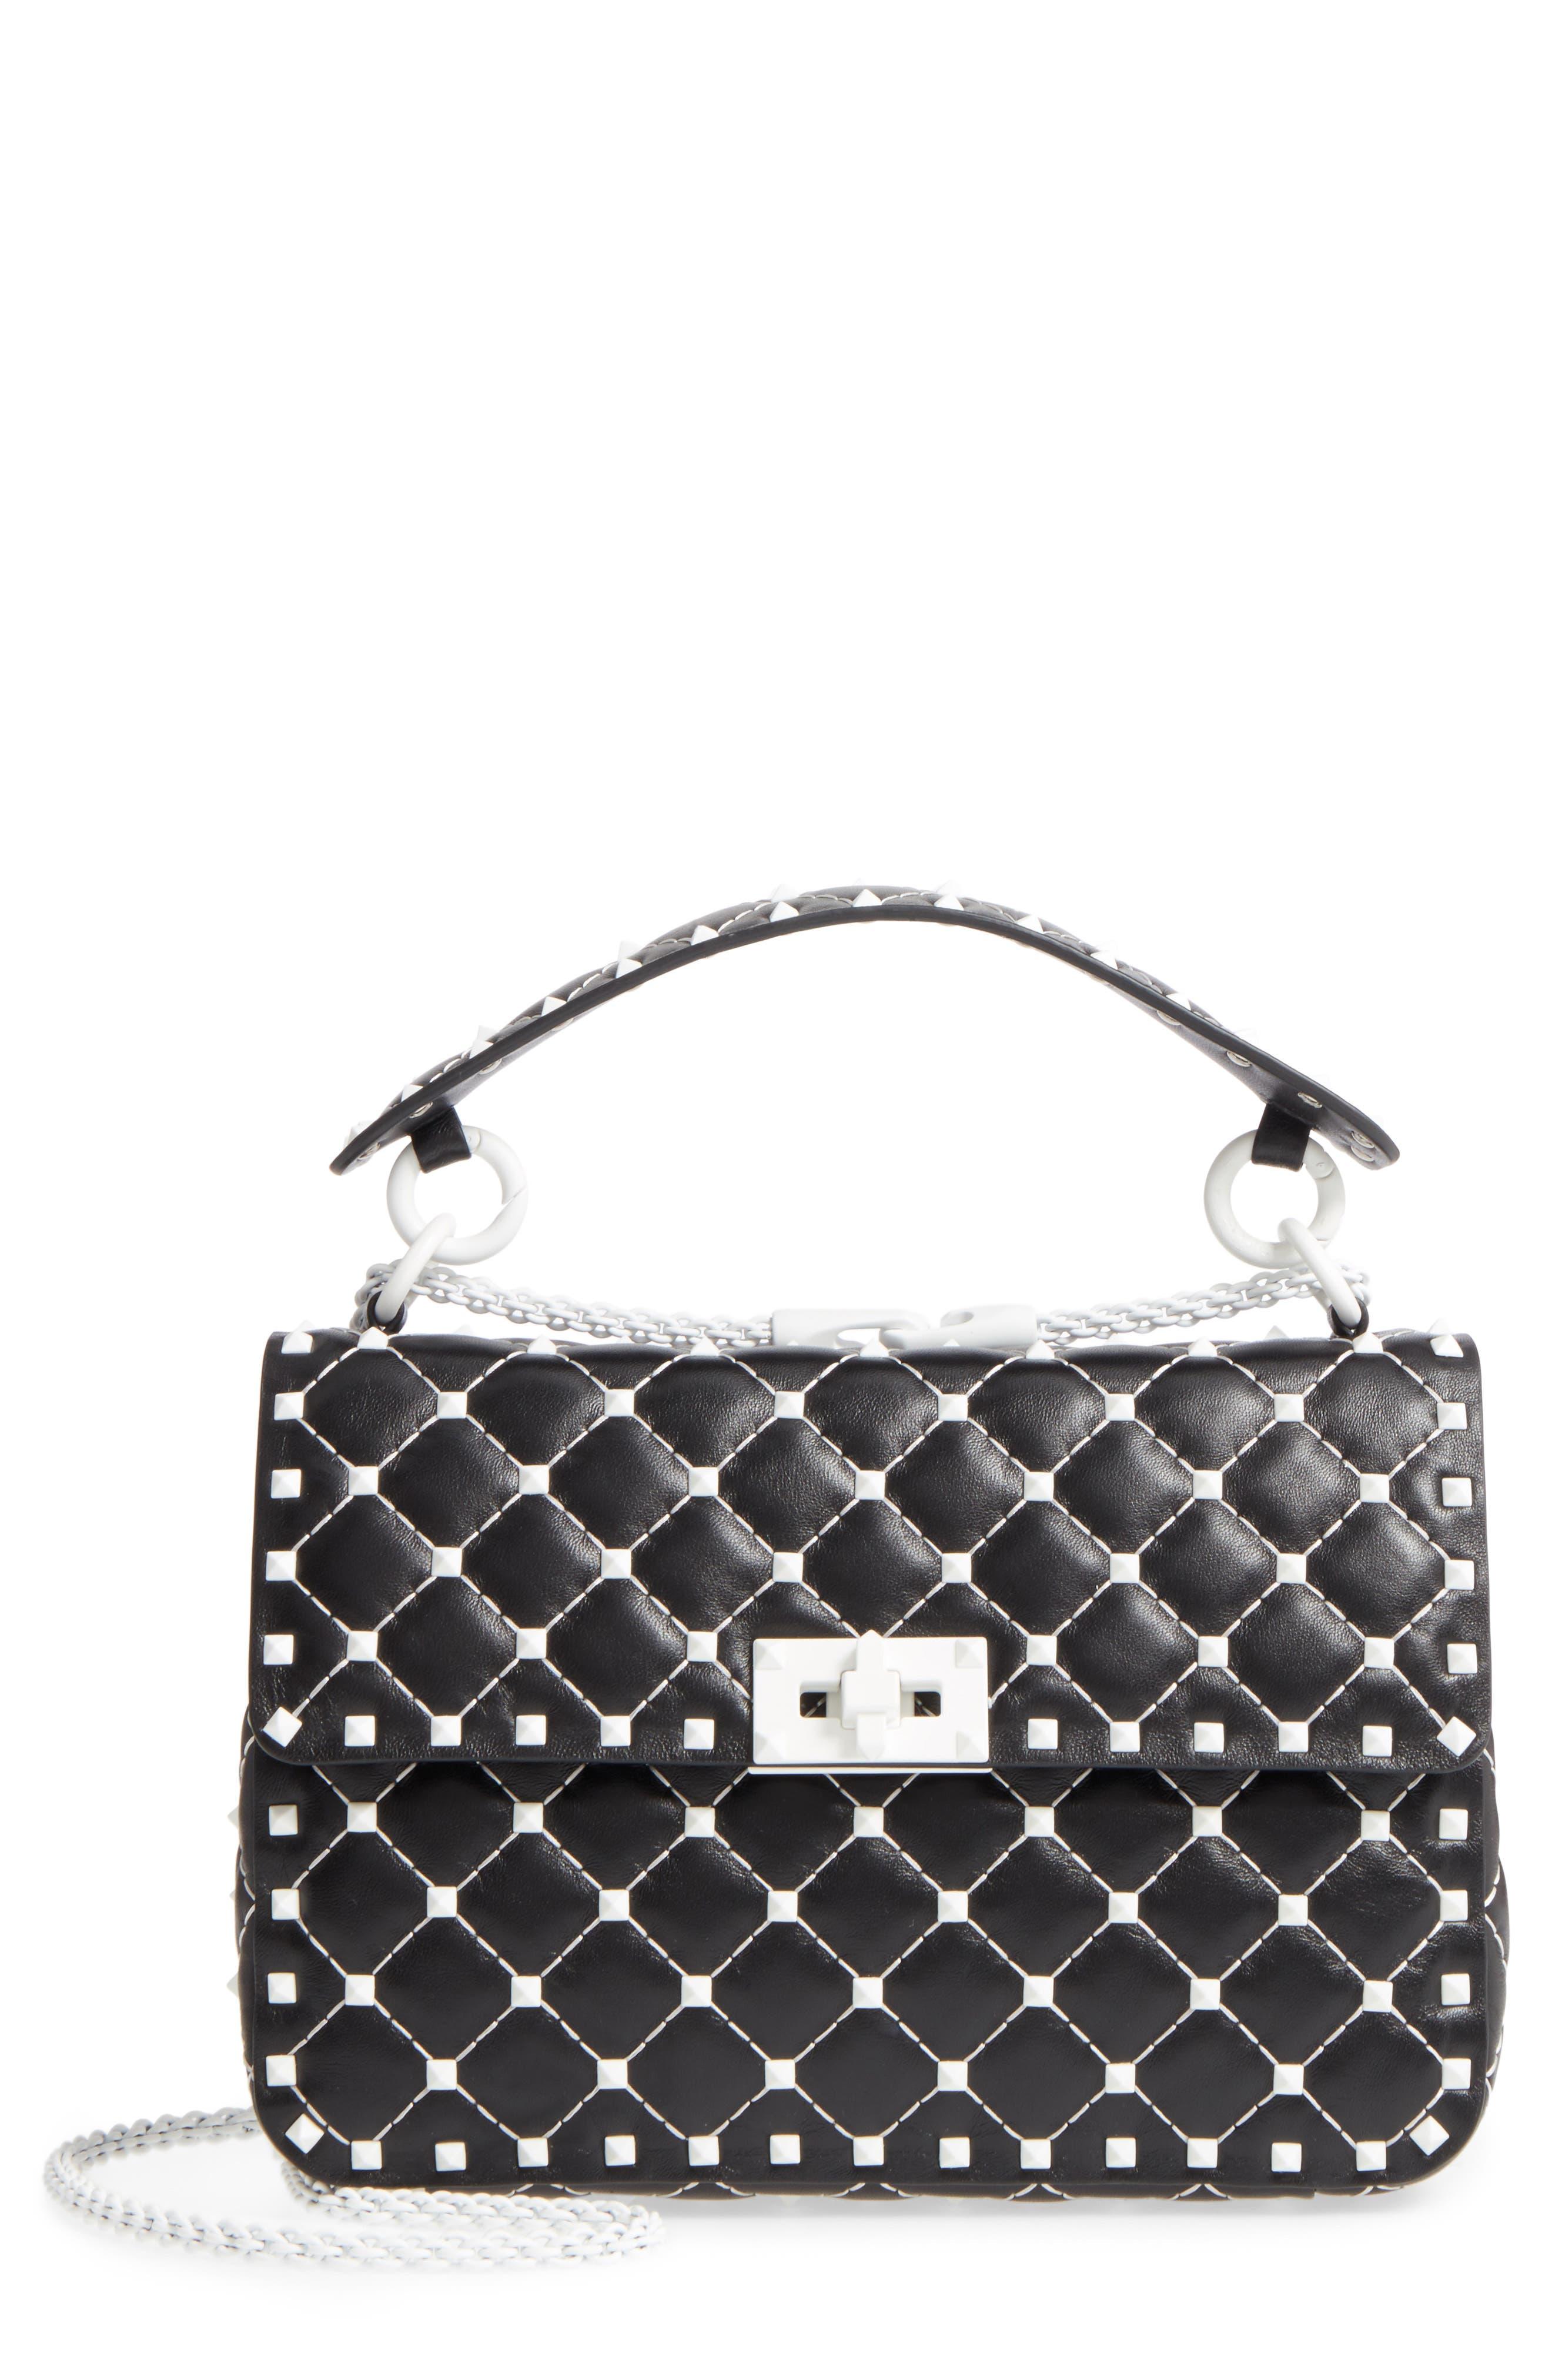 Medium Rockstud Matelassé Leather Shoulder Bag,                         Main,                         color, Black